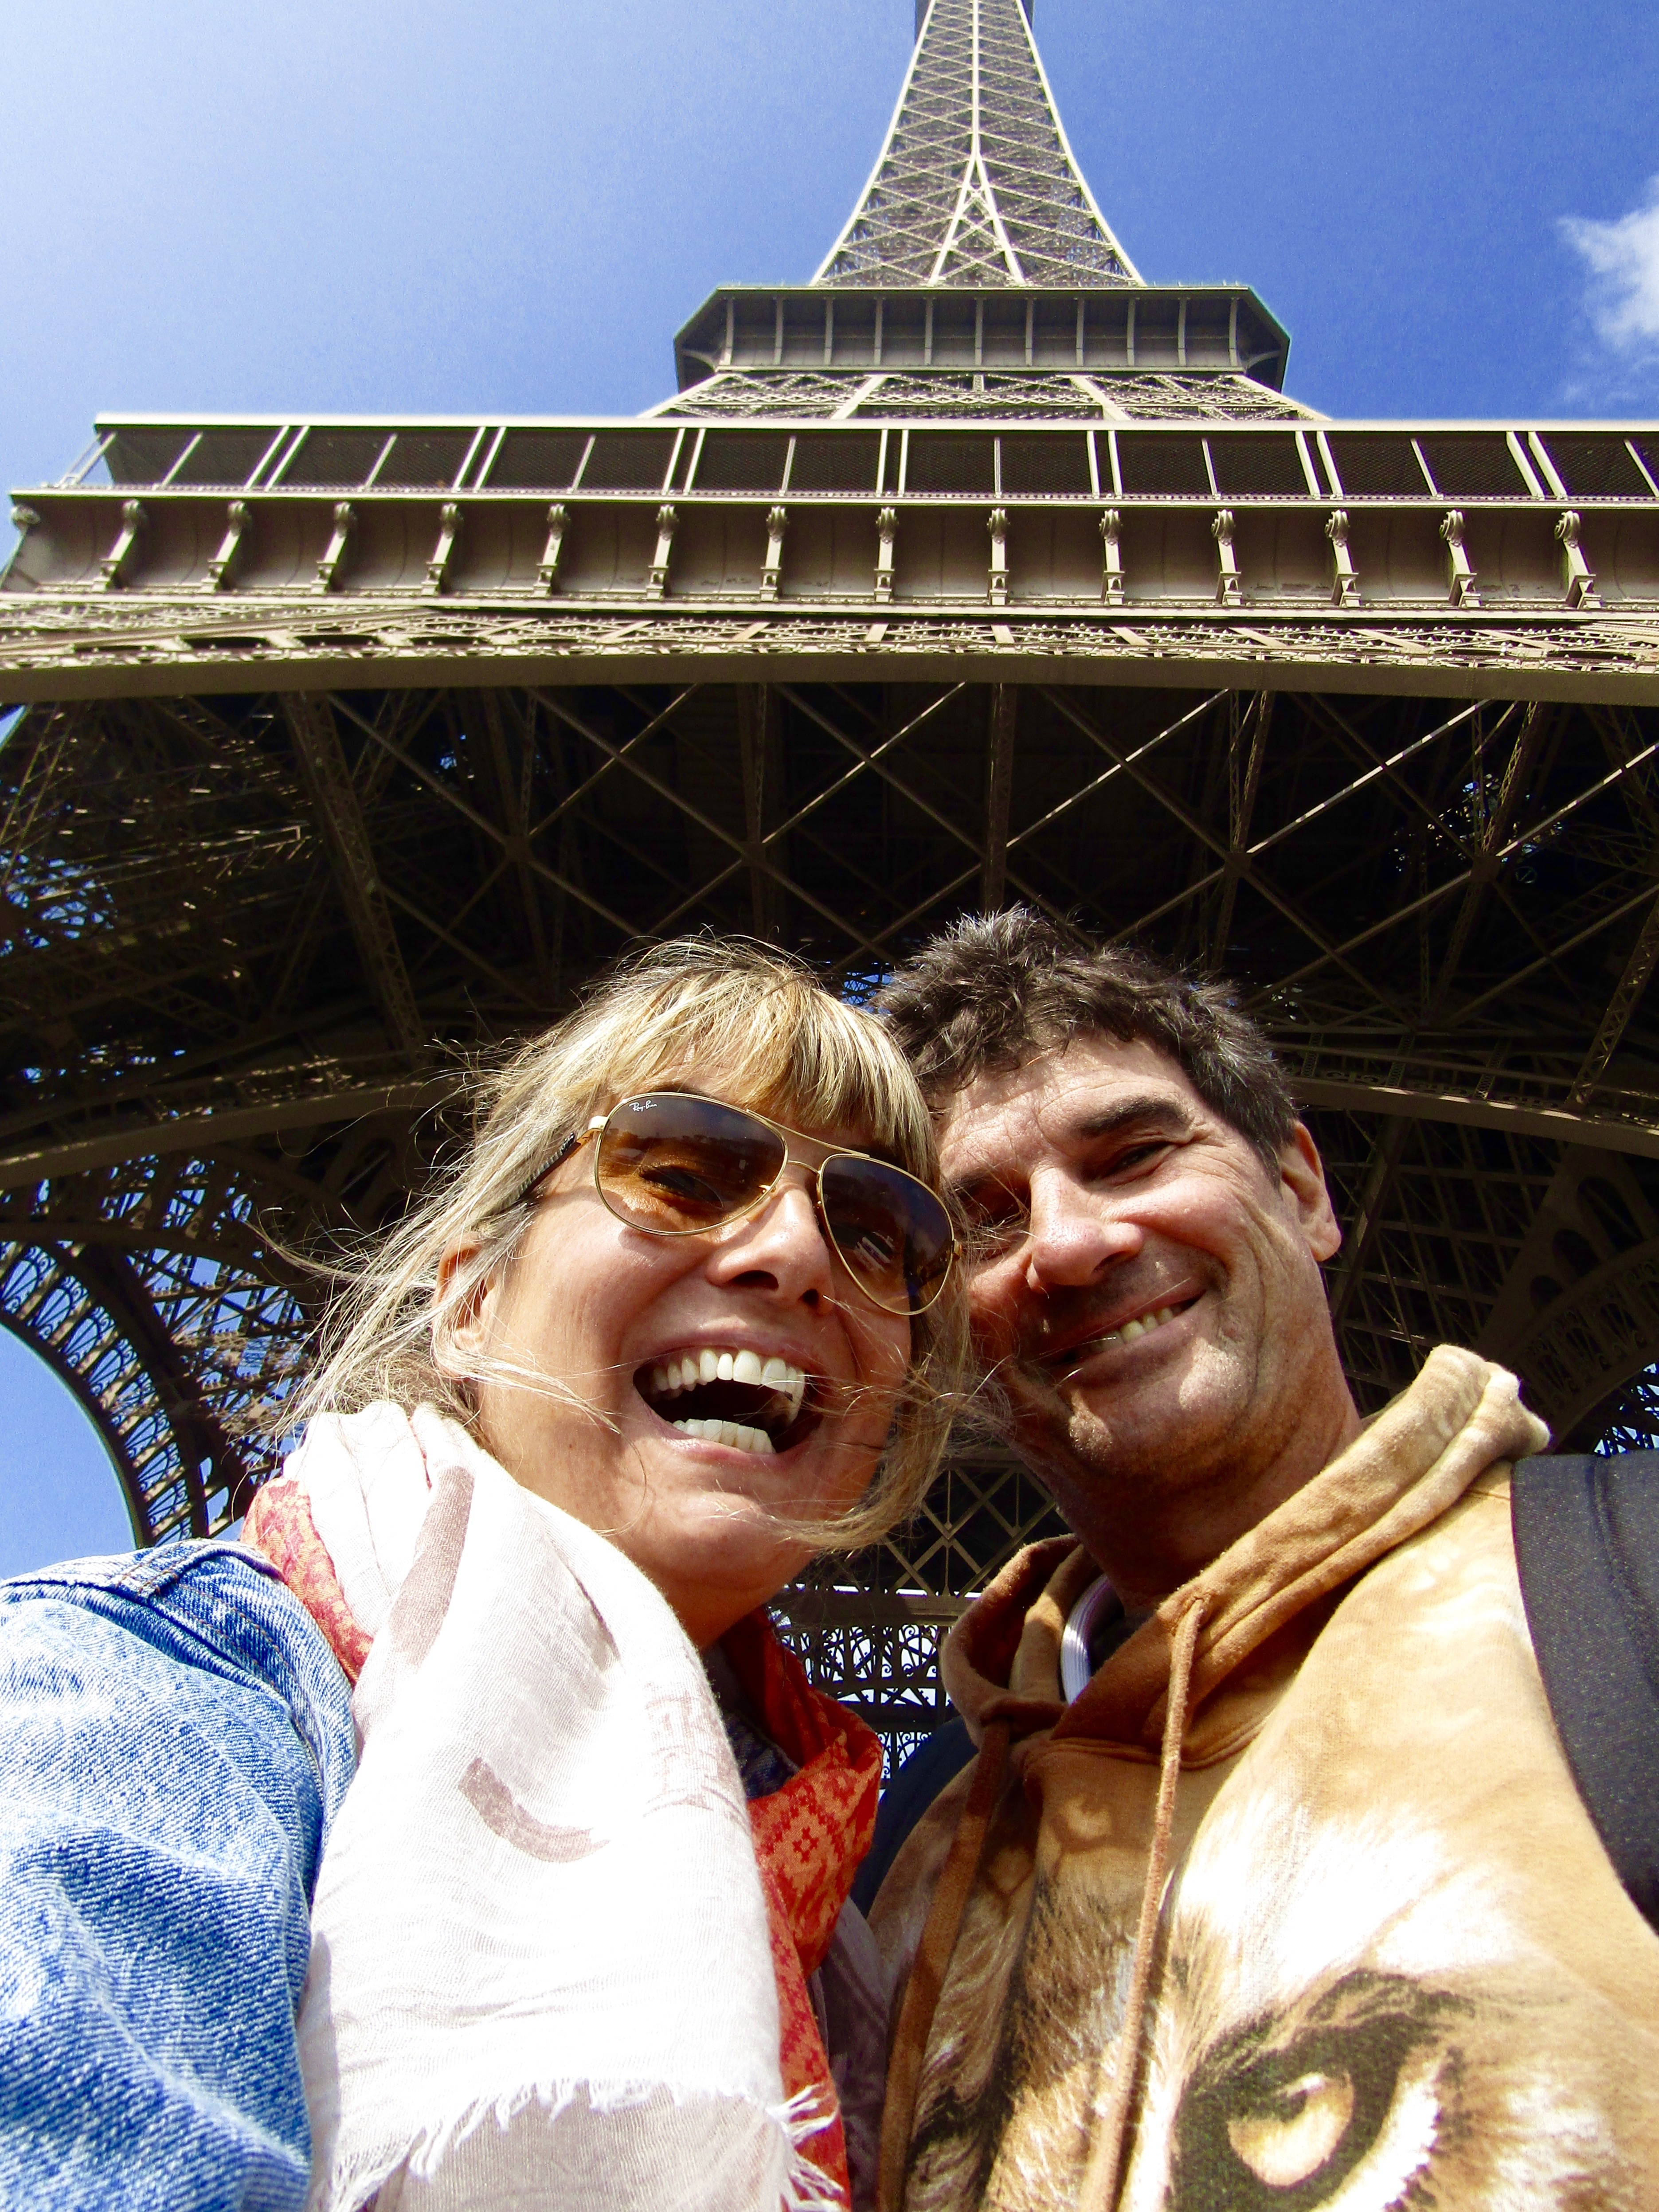 April 1st, 2016 - Paris, France - Joyful Stephanie